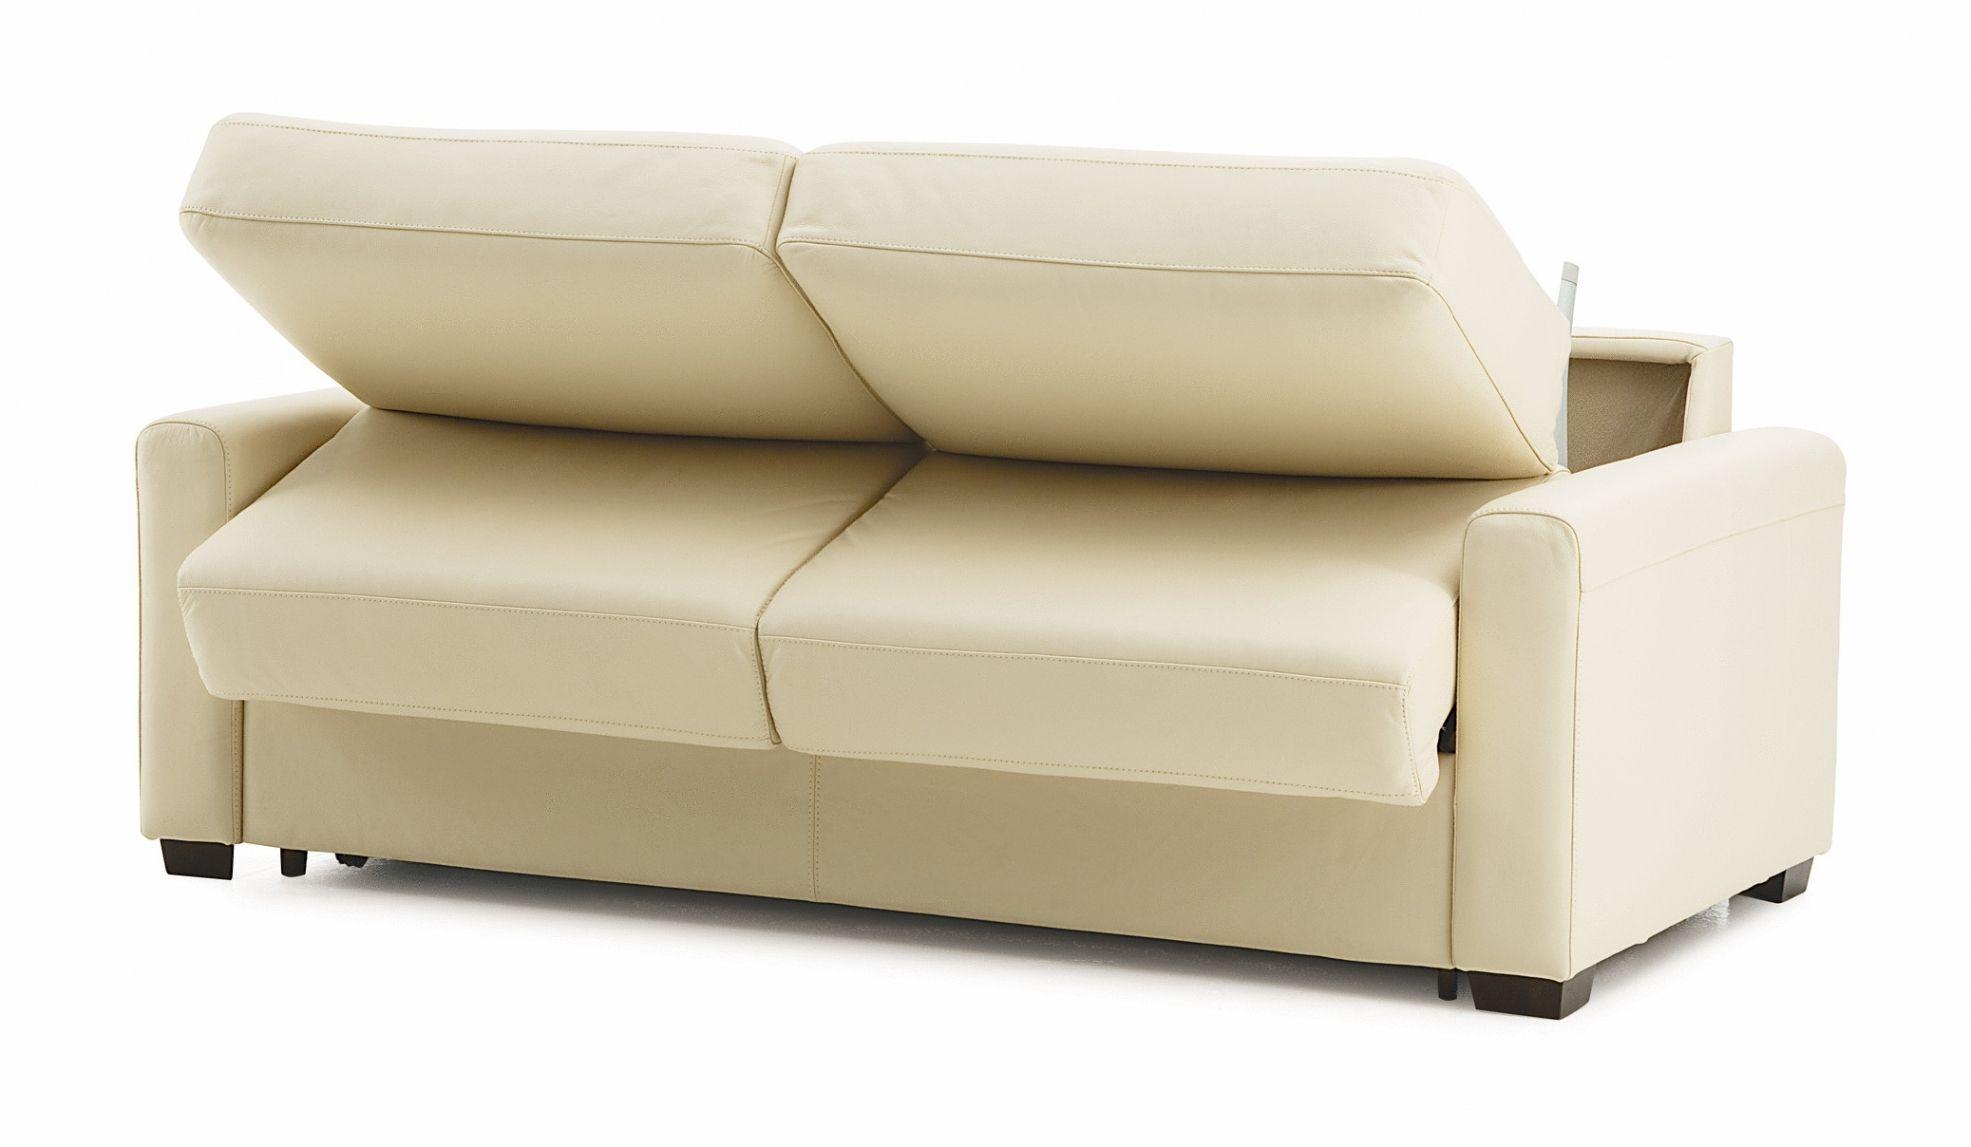 The Best and Elegant Sofa Sleeper Design for Your Home http://freshouz.com/elegant-sofa-sleeper-design/